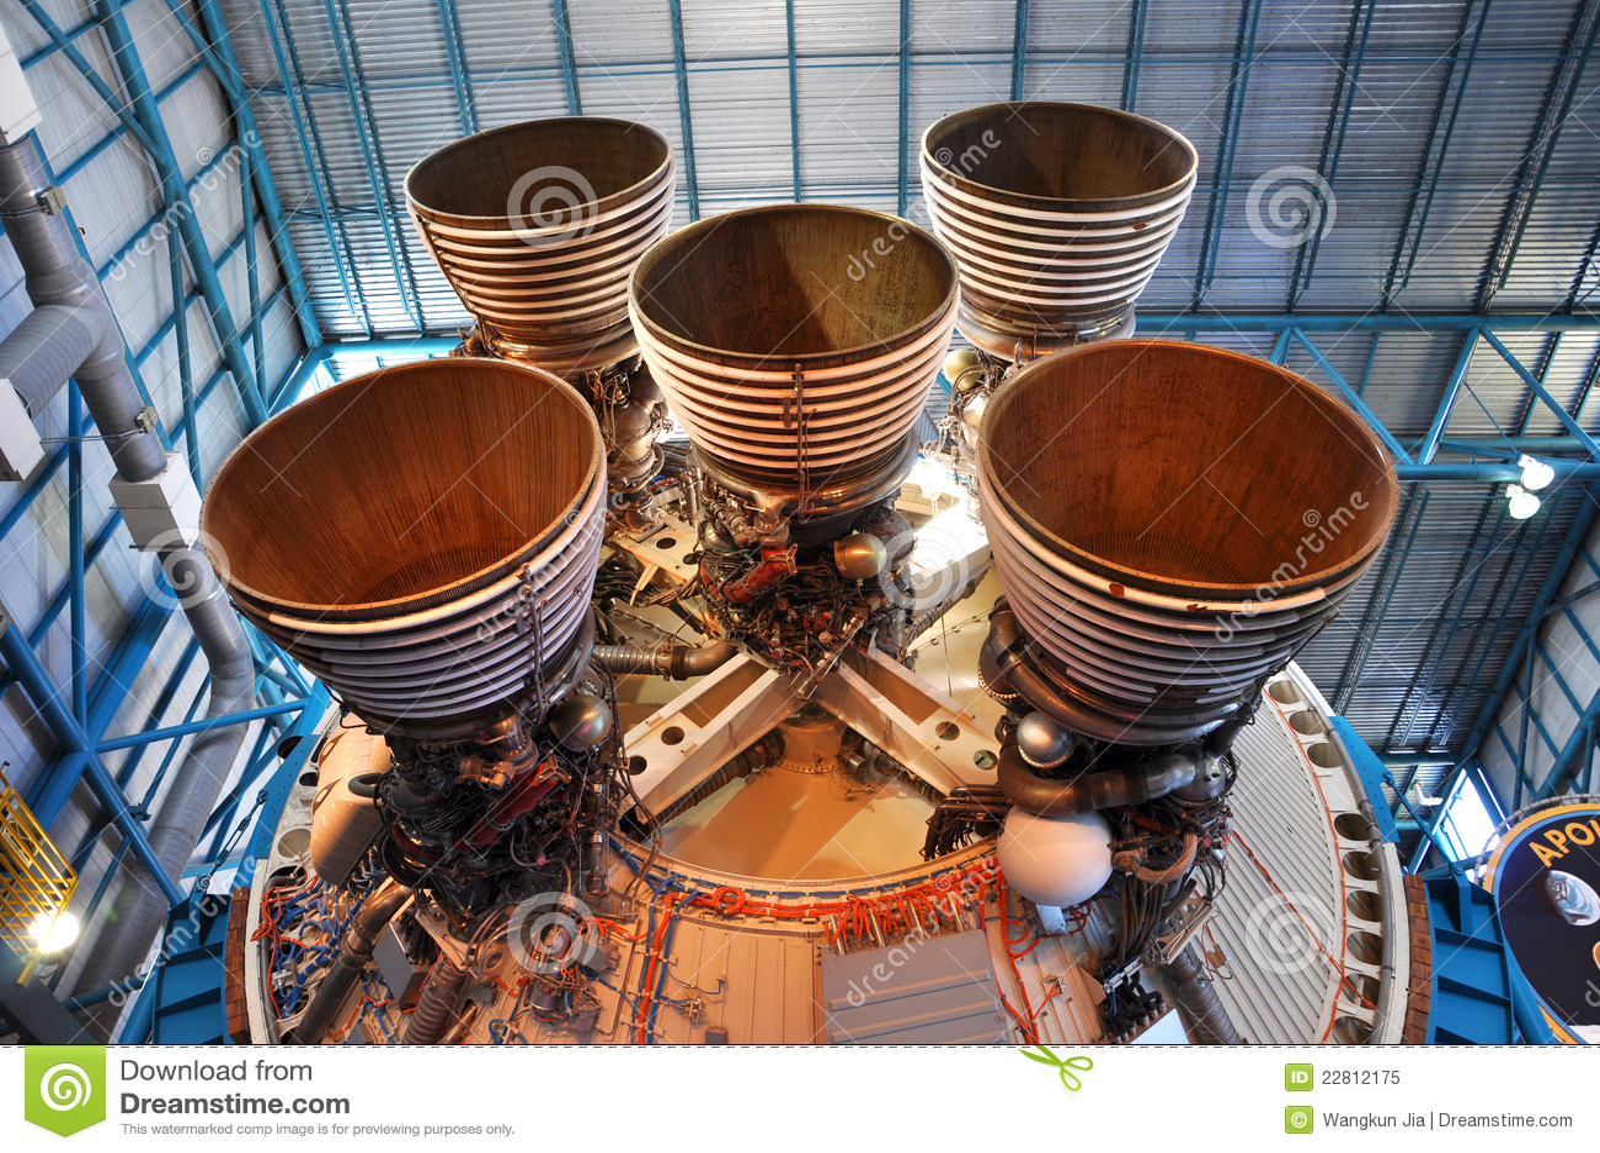 Saturn V Rocket Engines, Cape Canaveral, Florida